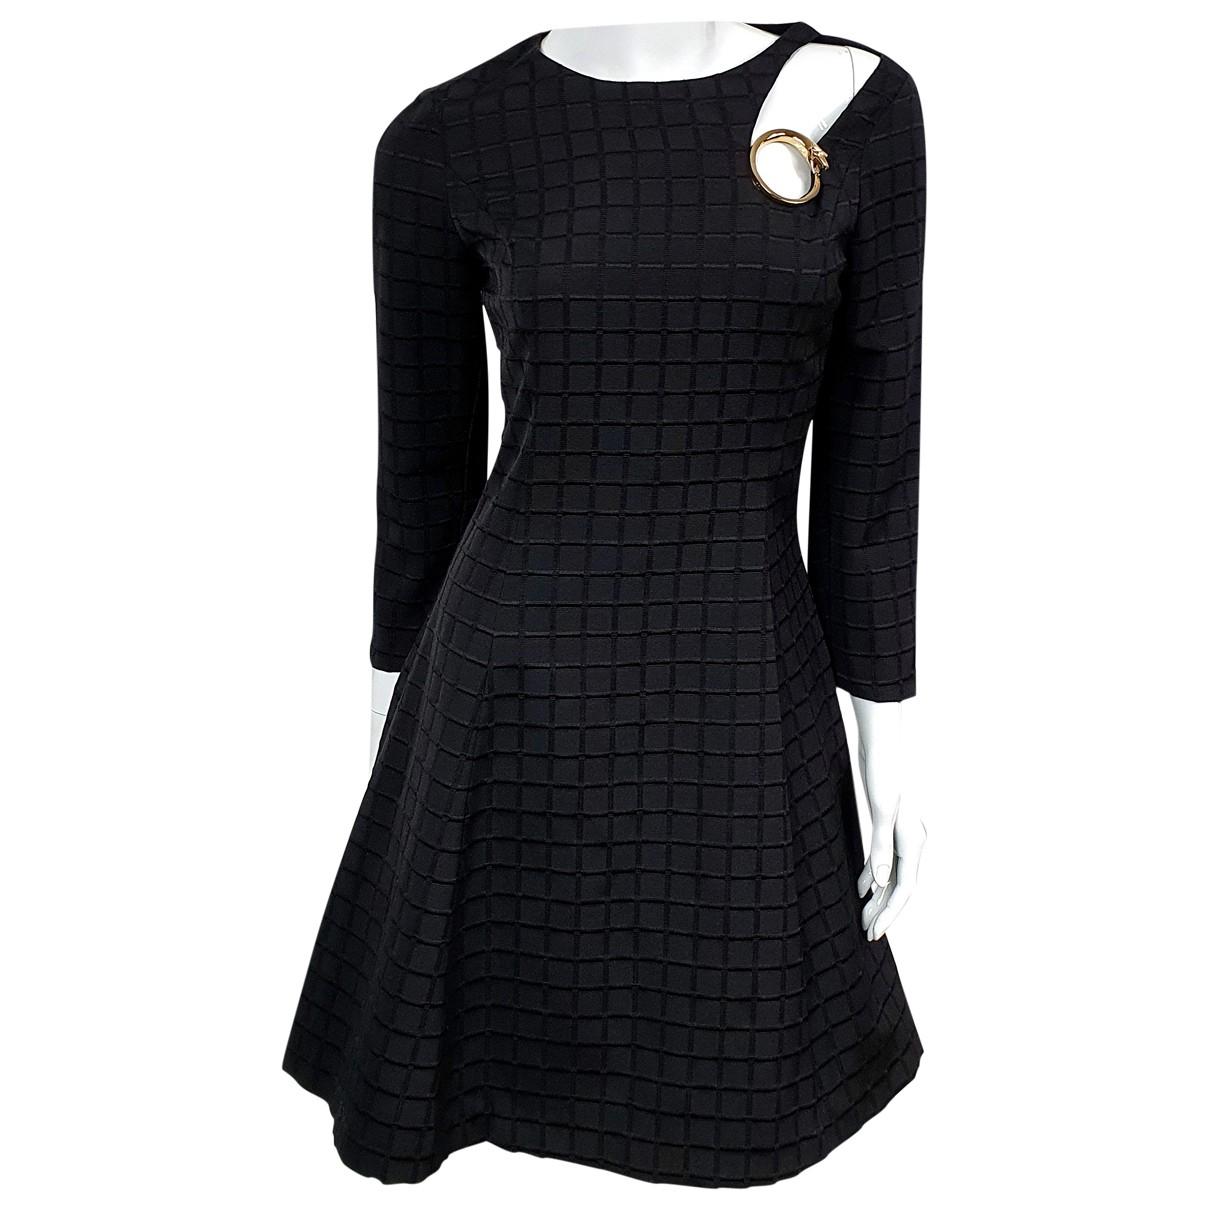 Class Cavalli \N Black Cotton dress for Women 40 IT